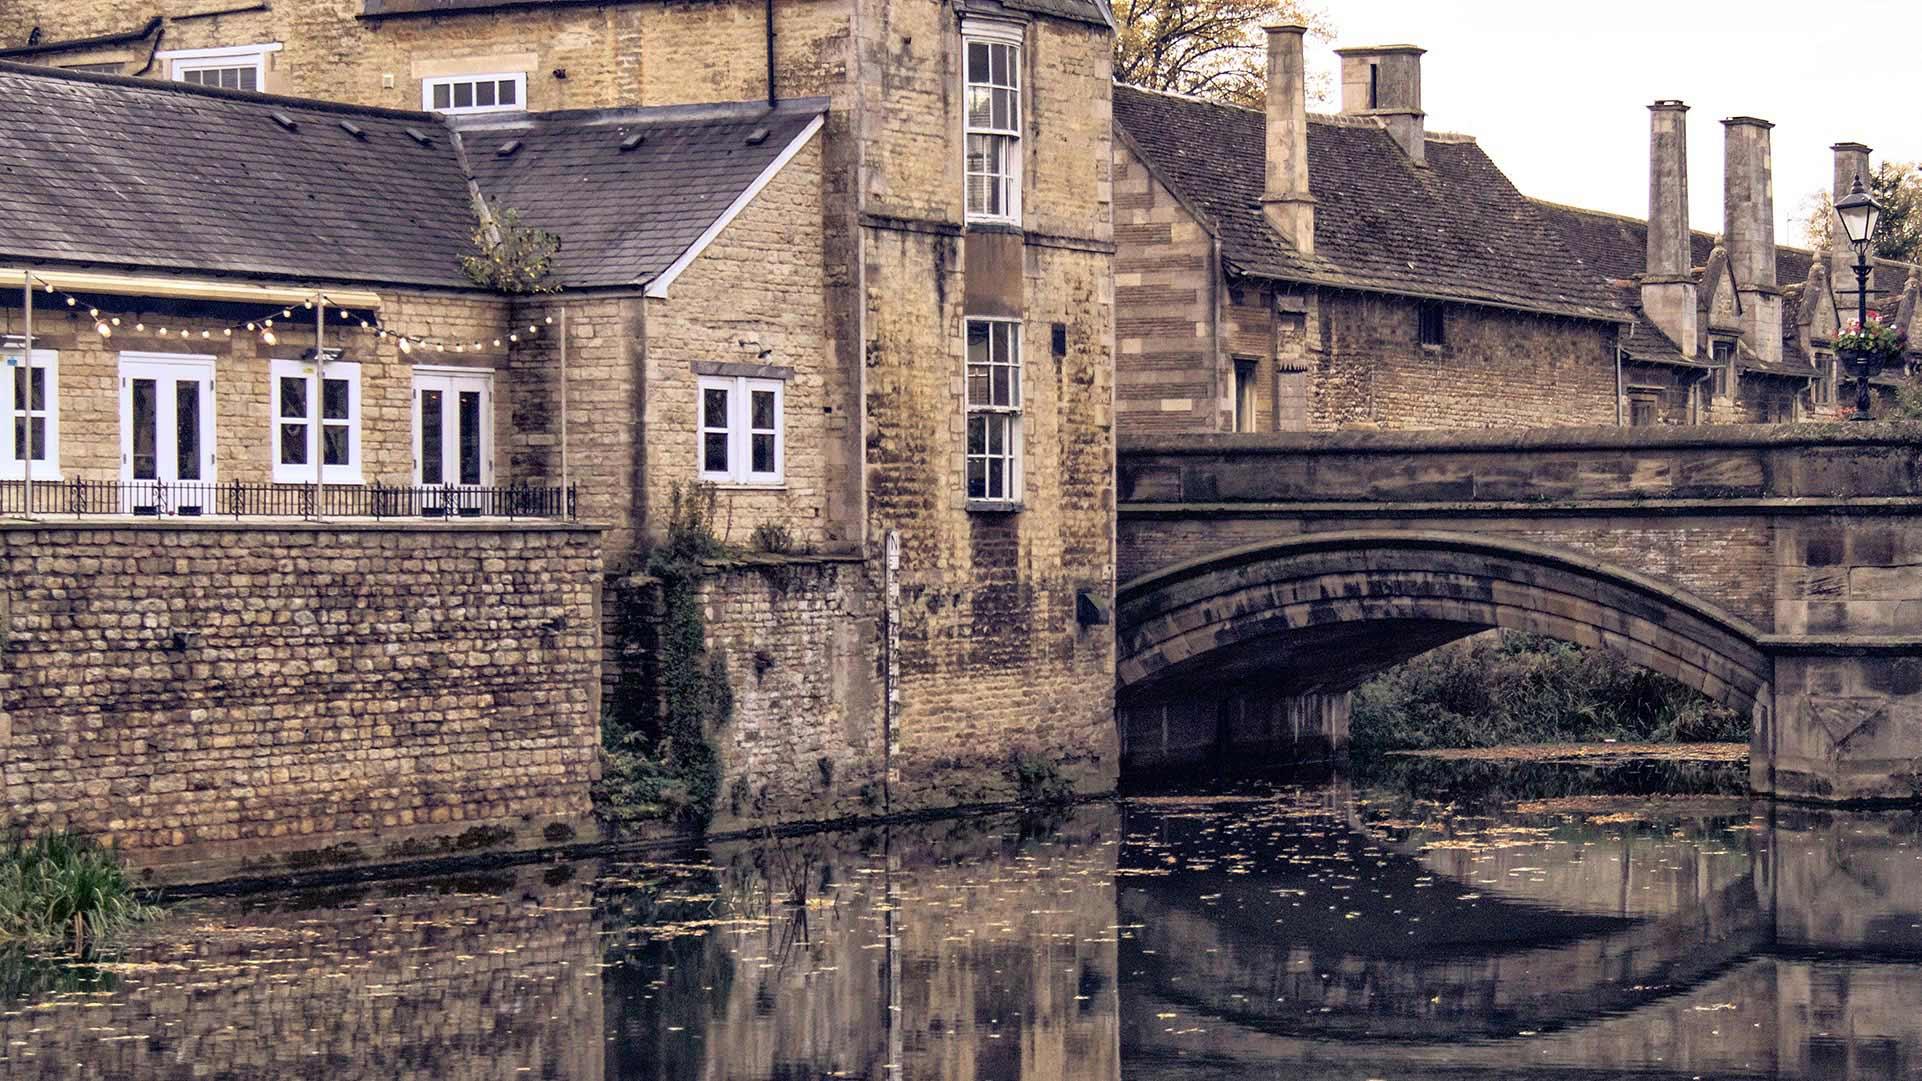 Stamford's Georgian buildings next to bridge